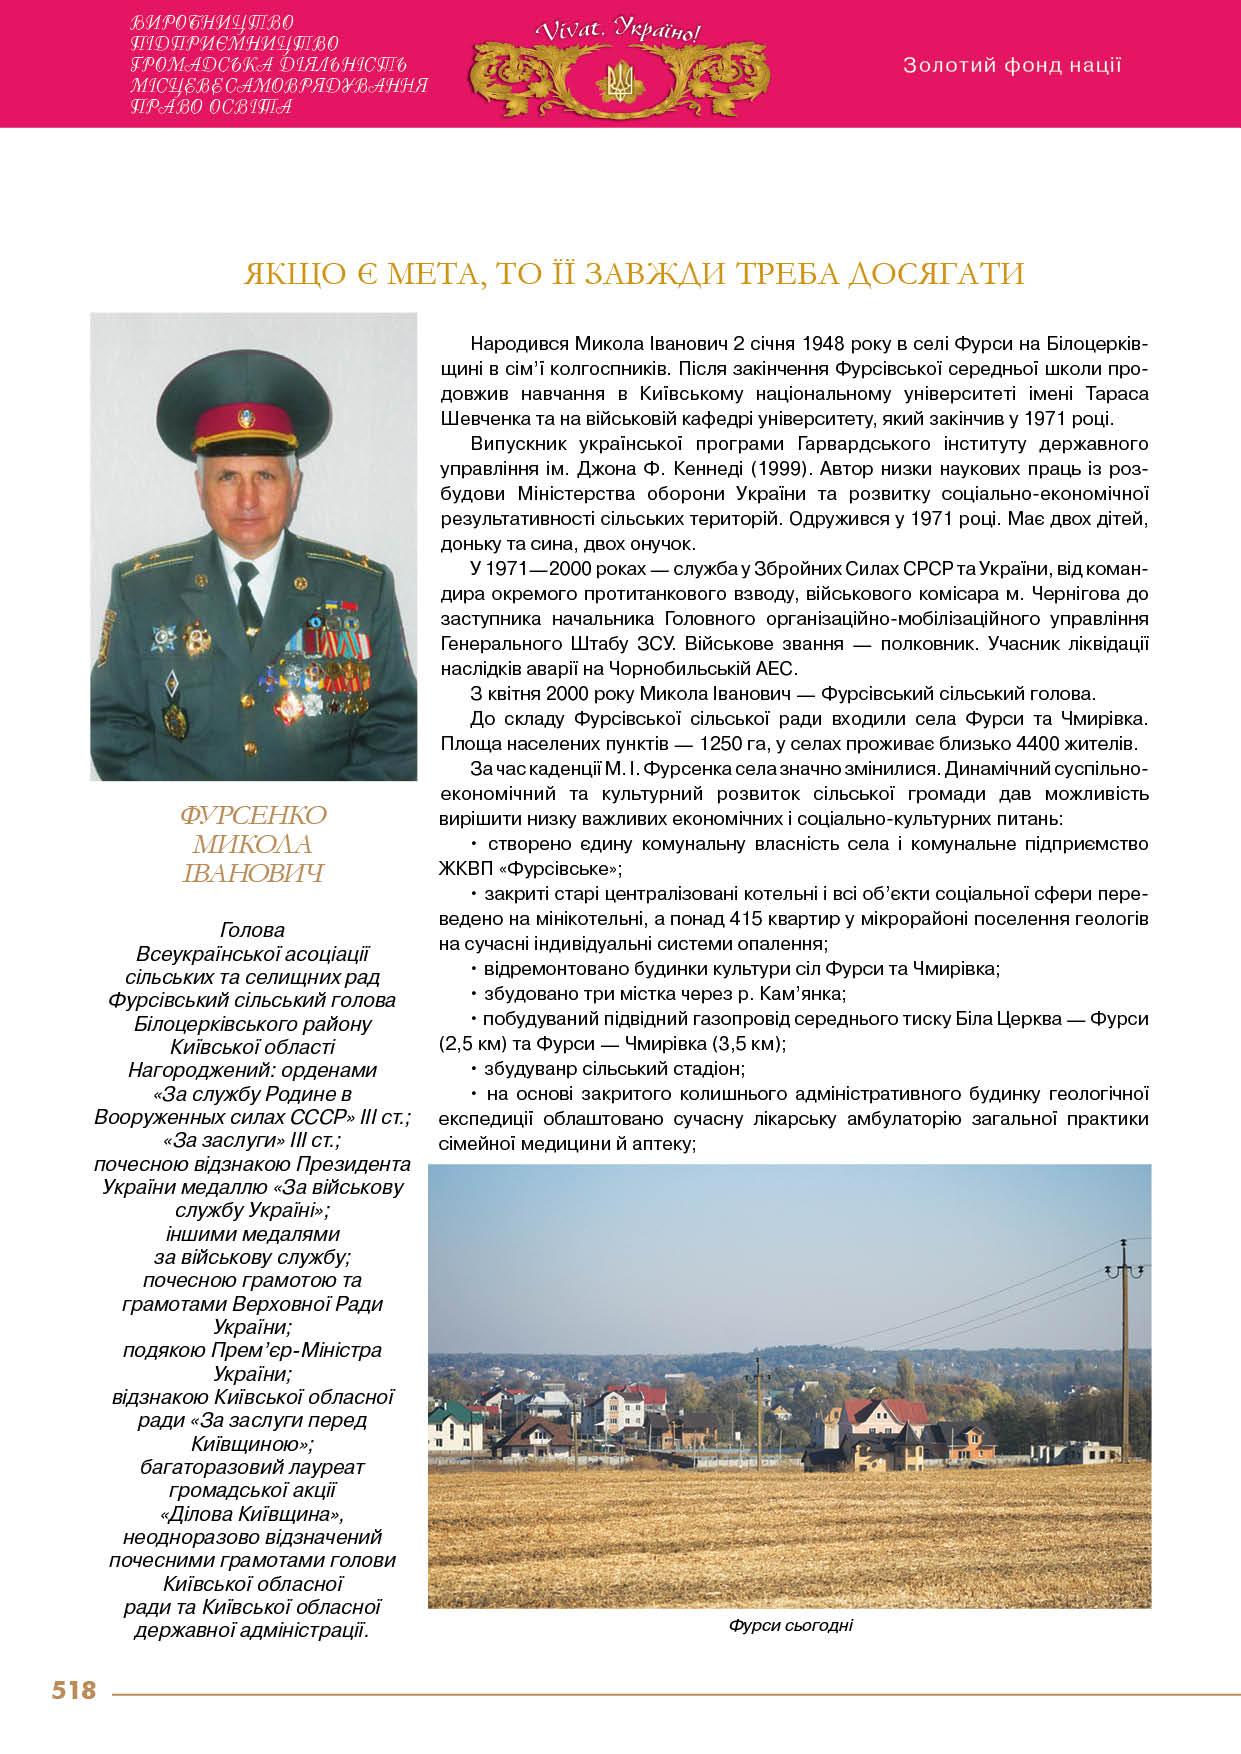 Фурсенко Микола Іванович